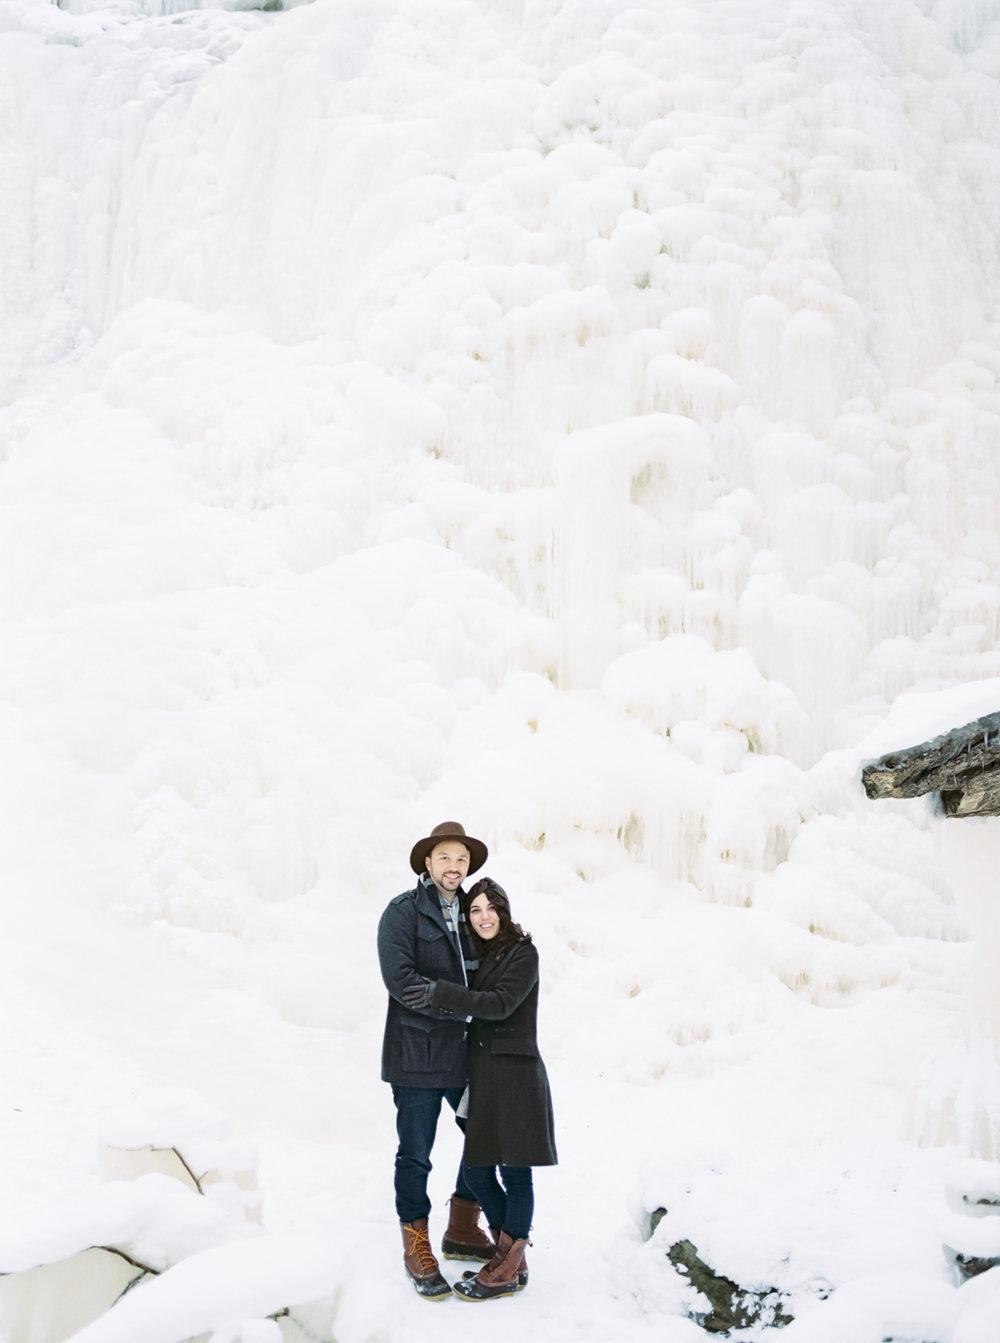 Frozen Brandywine Falls Photos by Cleveland Wedding Photographer Matt Erickson Photography